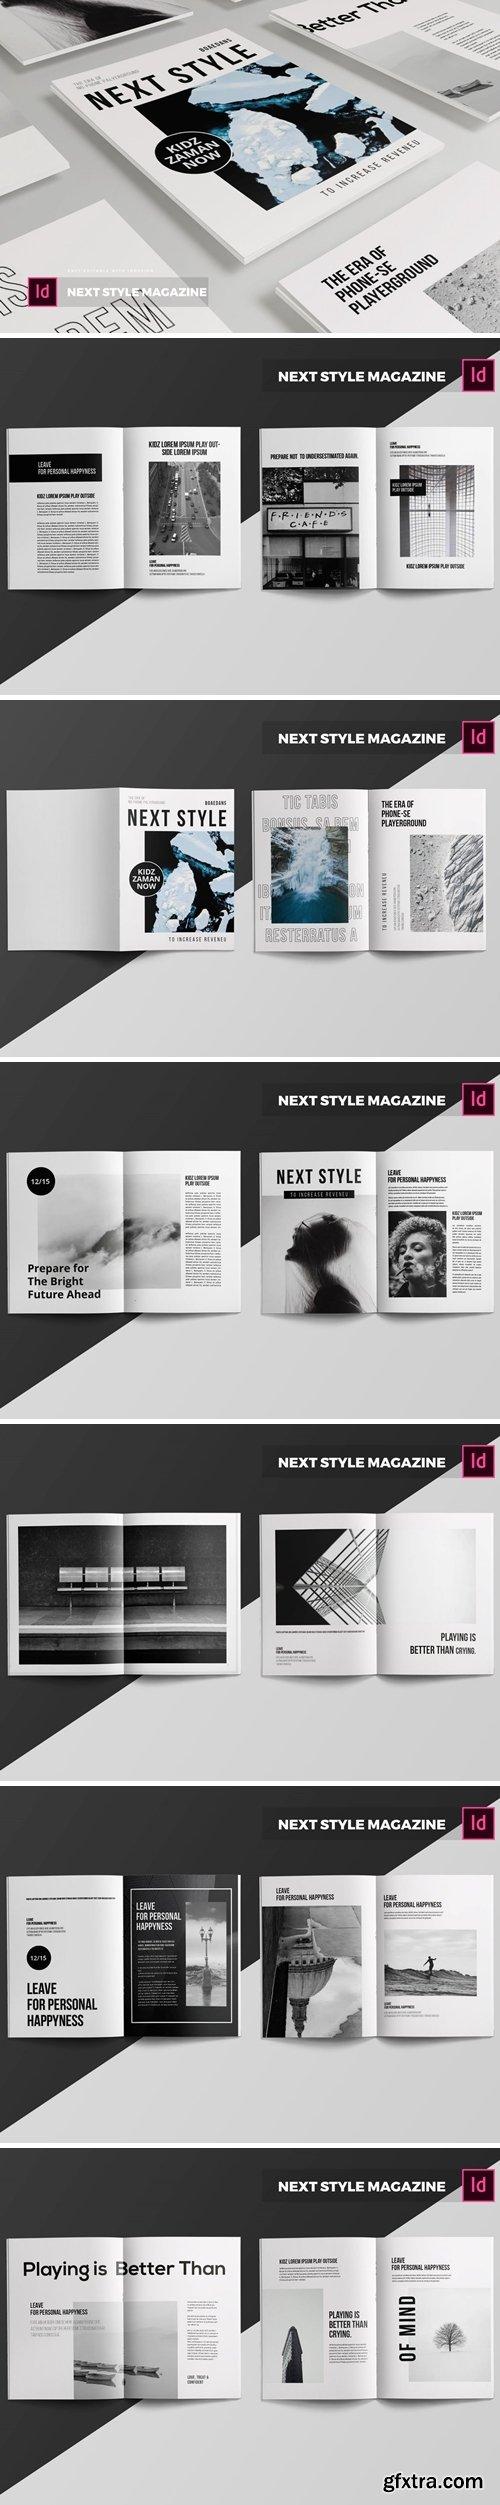 Next Style   Magazine Template